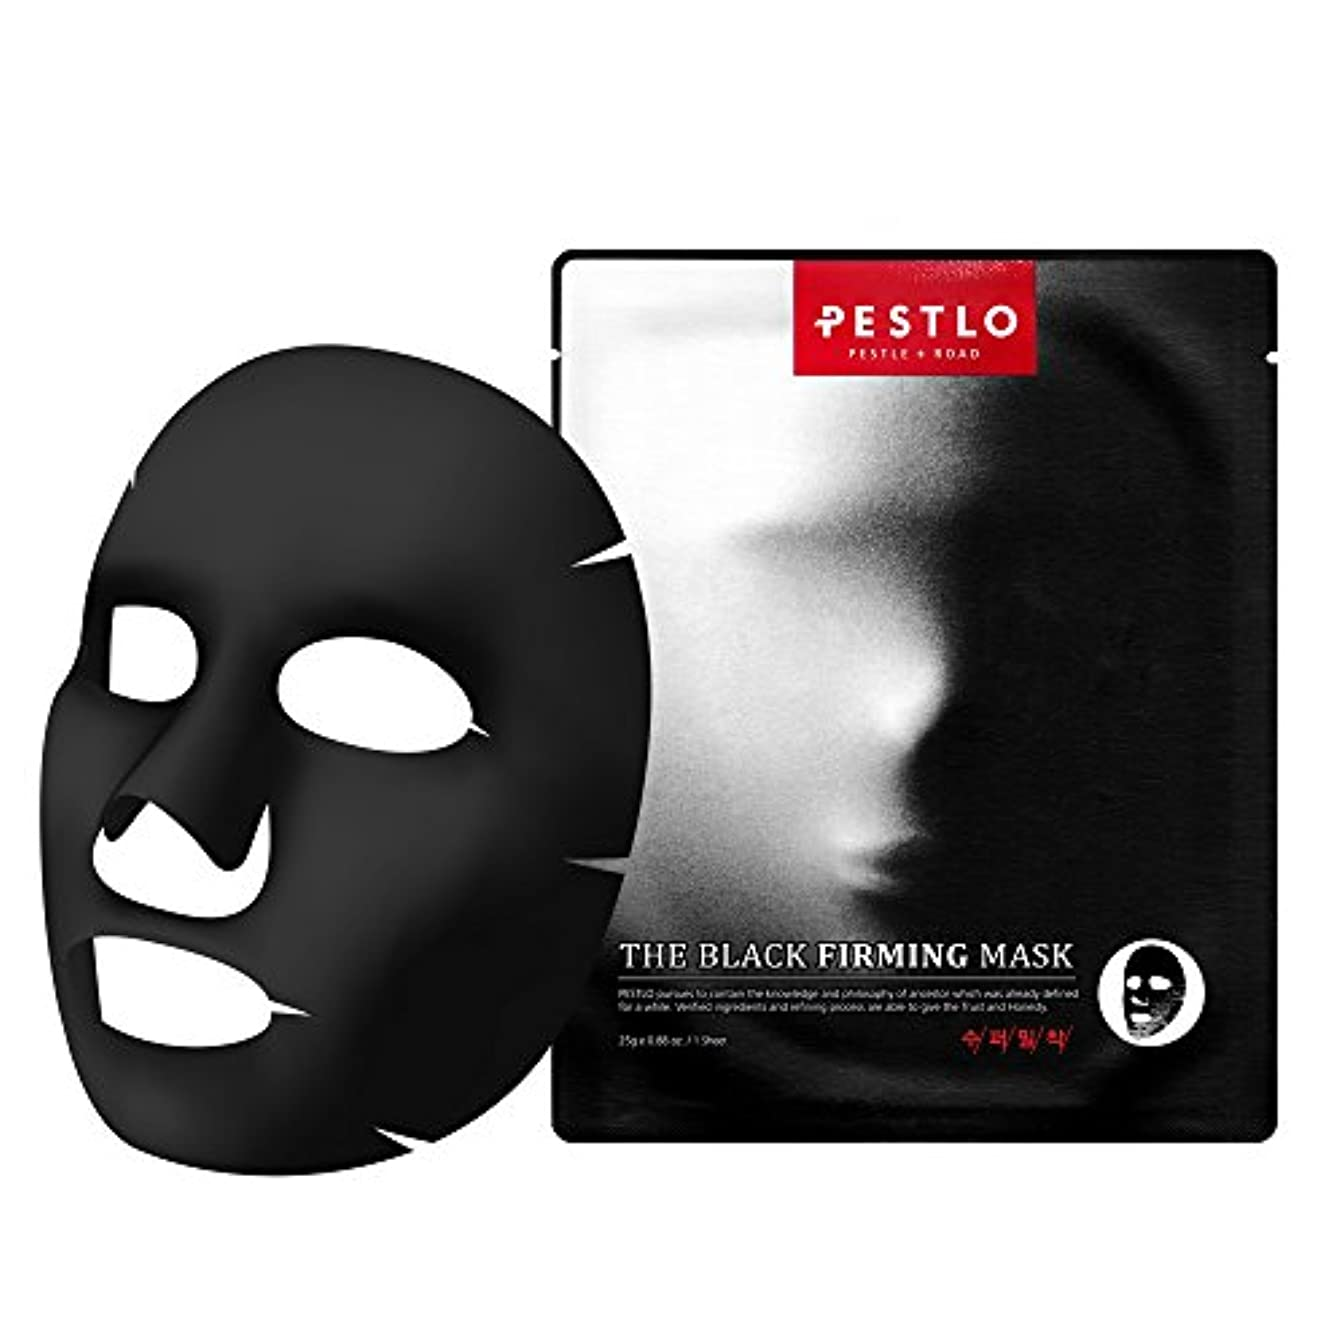 Pestlo The Black Firming Mask 【ペスロザブラックファーミングマスク】 - モイスチャ アンチエイジング 老化防止 抗酸化効果 透明スキンケア 韓国コスメ 1シート / 25g